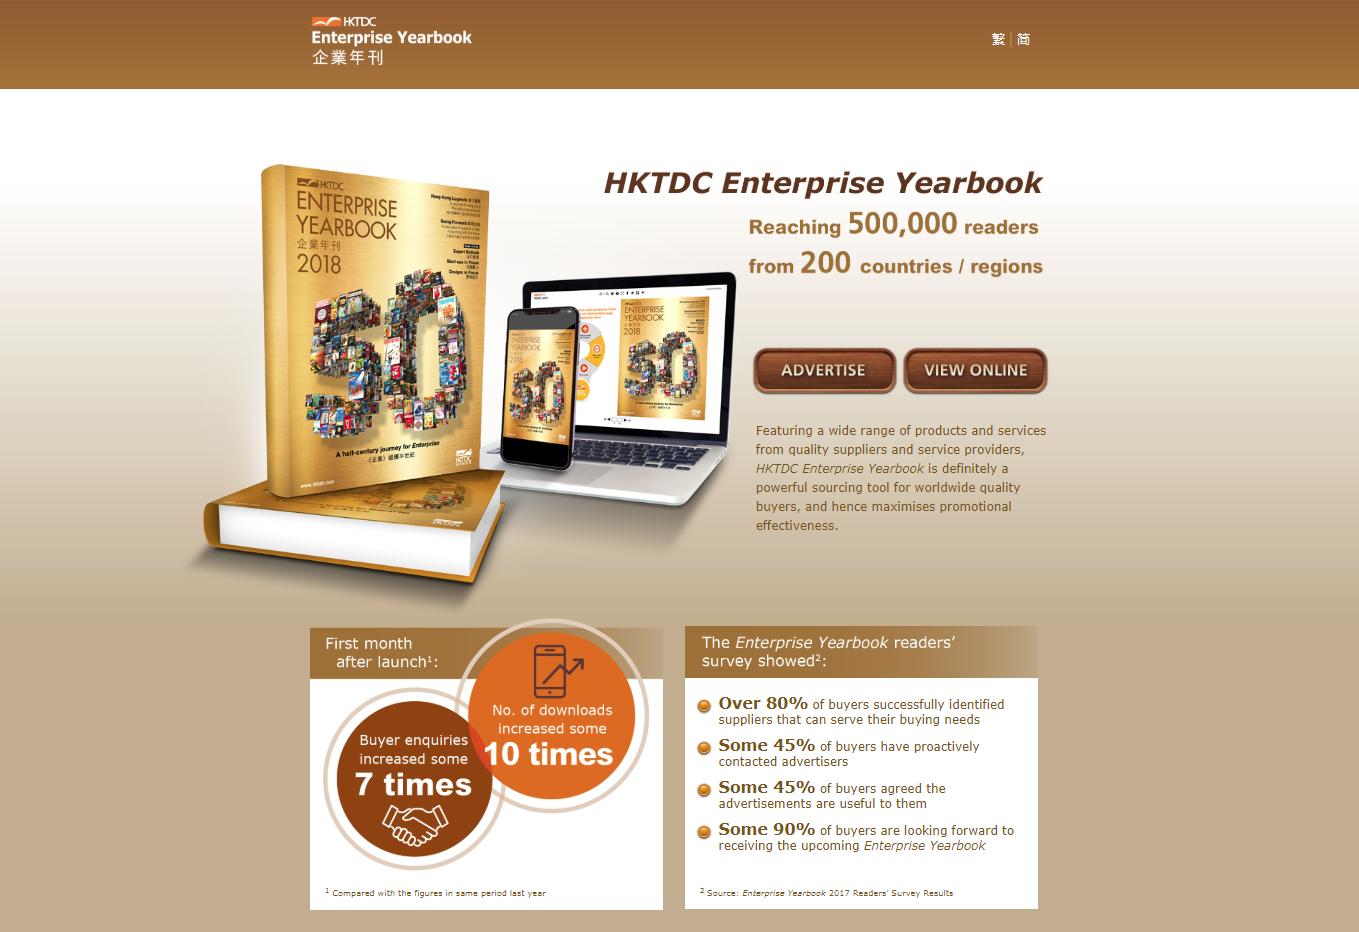 image of Hong Kong Trade Development Council Wins 2018 Best E-Zine Mobile Website Mobile WebAward for HKTDC Enterprise Yearbook Mobile Site